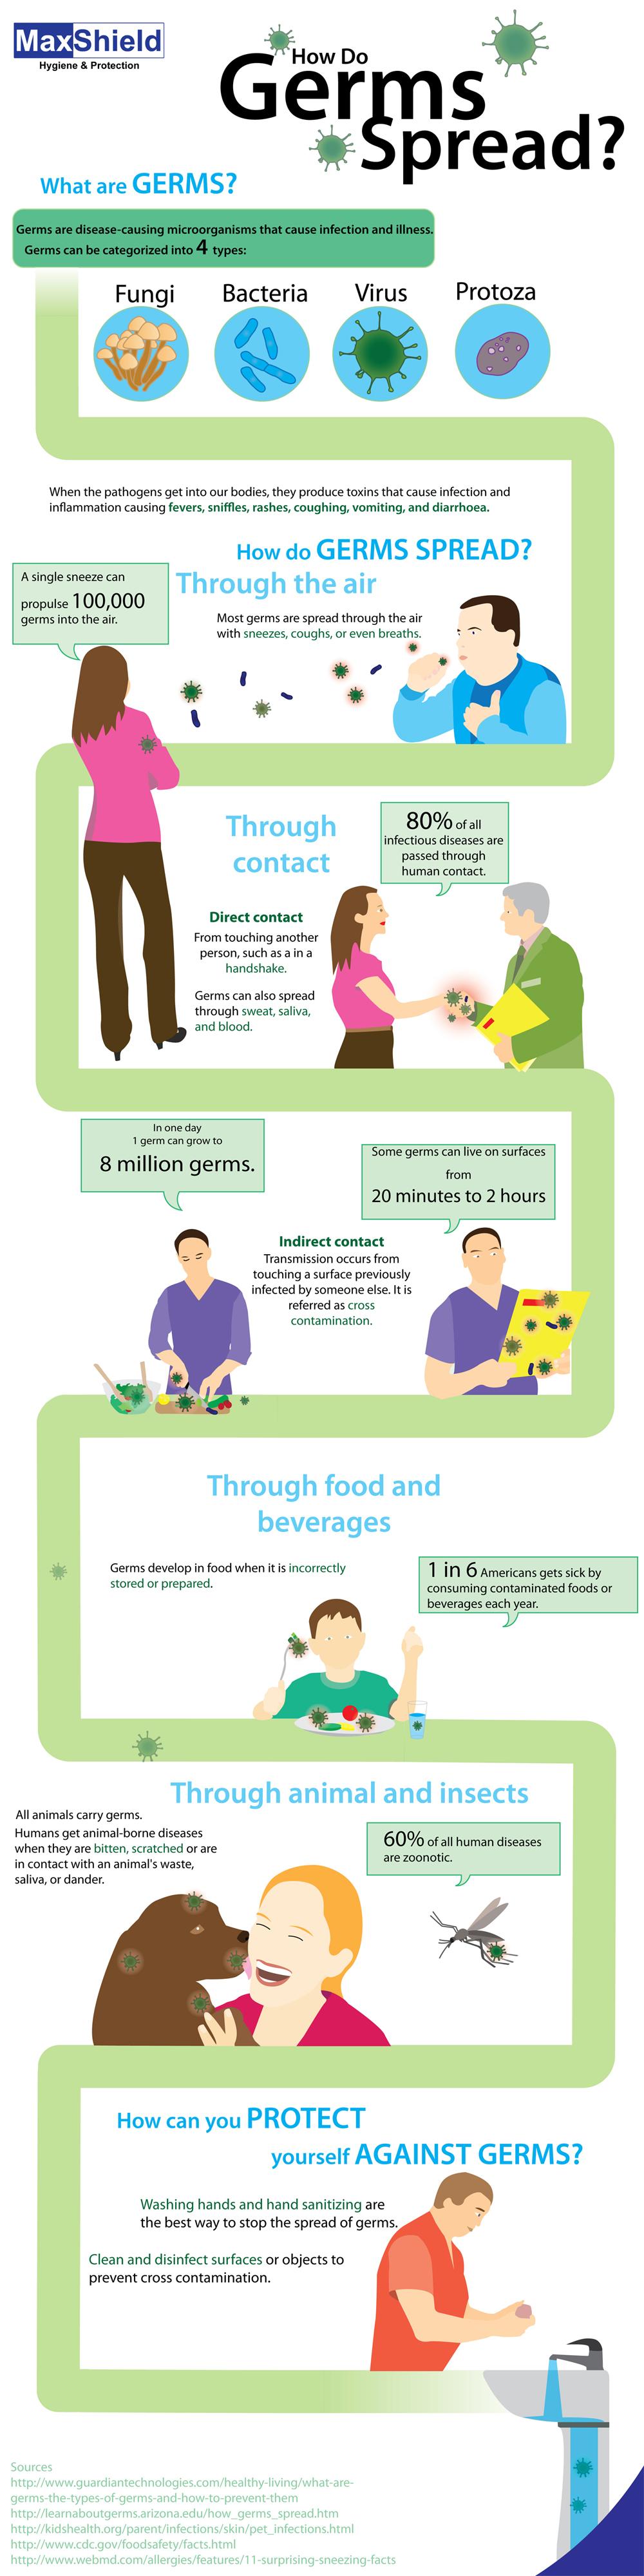 how do germs spread?